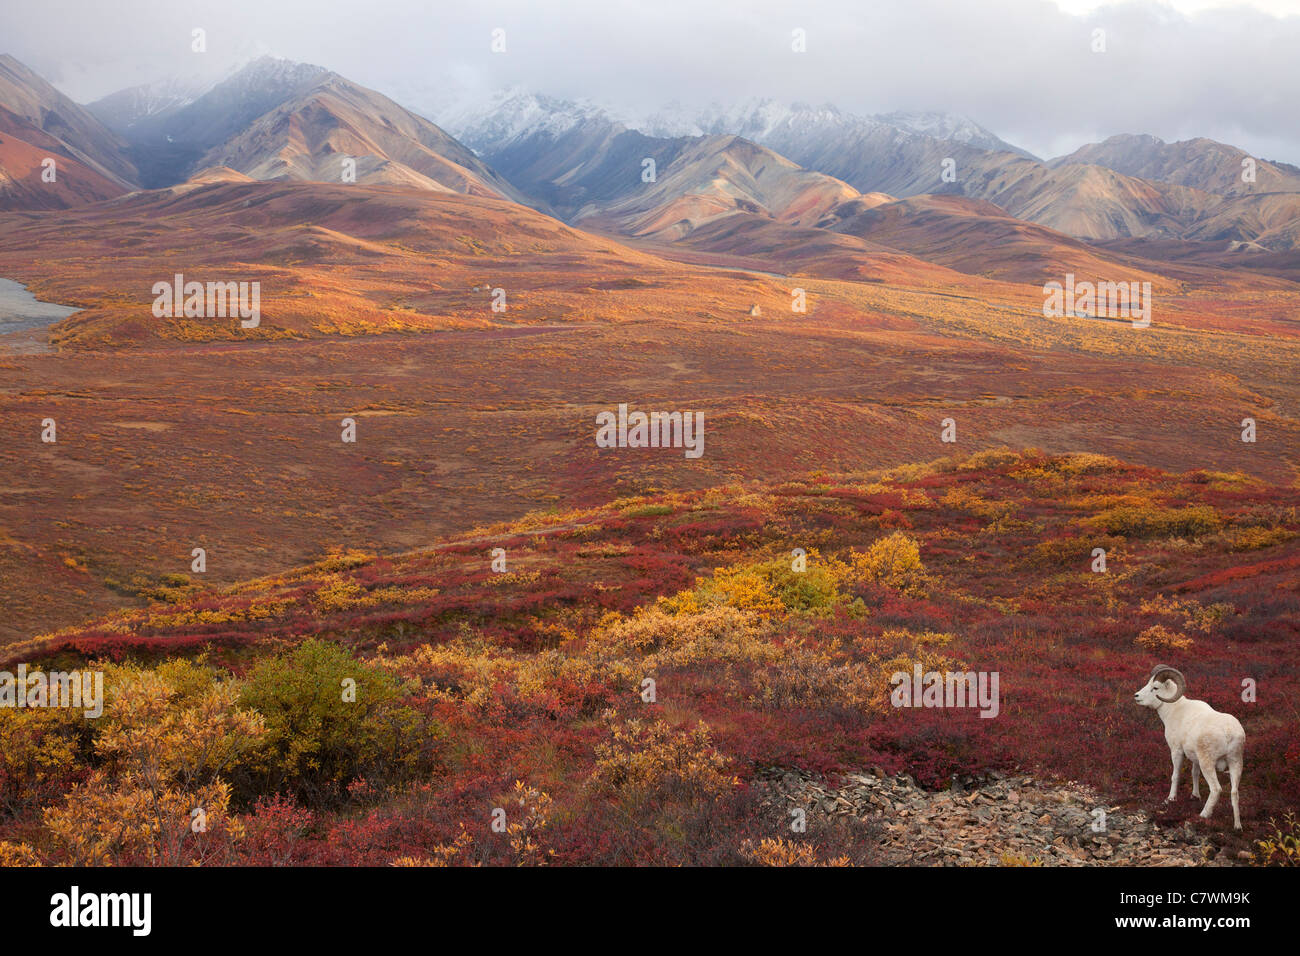 Les mouflons de Dall, Polychrome Pass, parc national Denali, en Alaska. Photo Stock